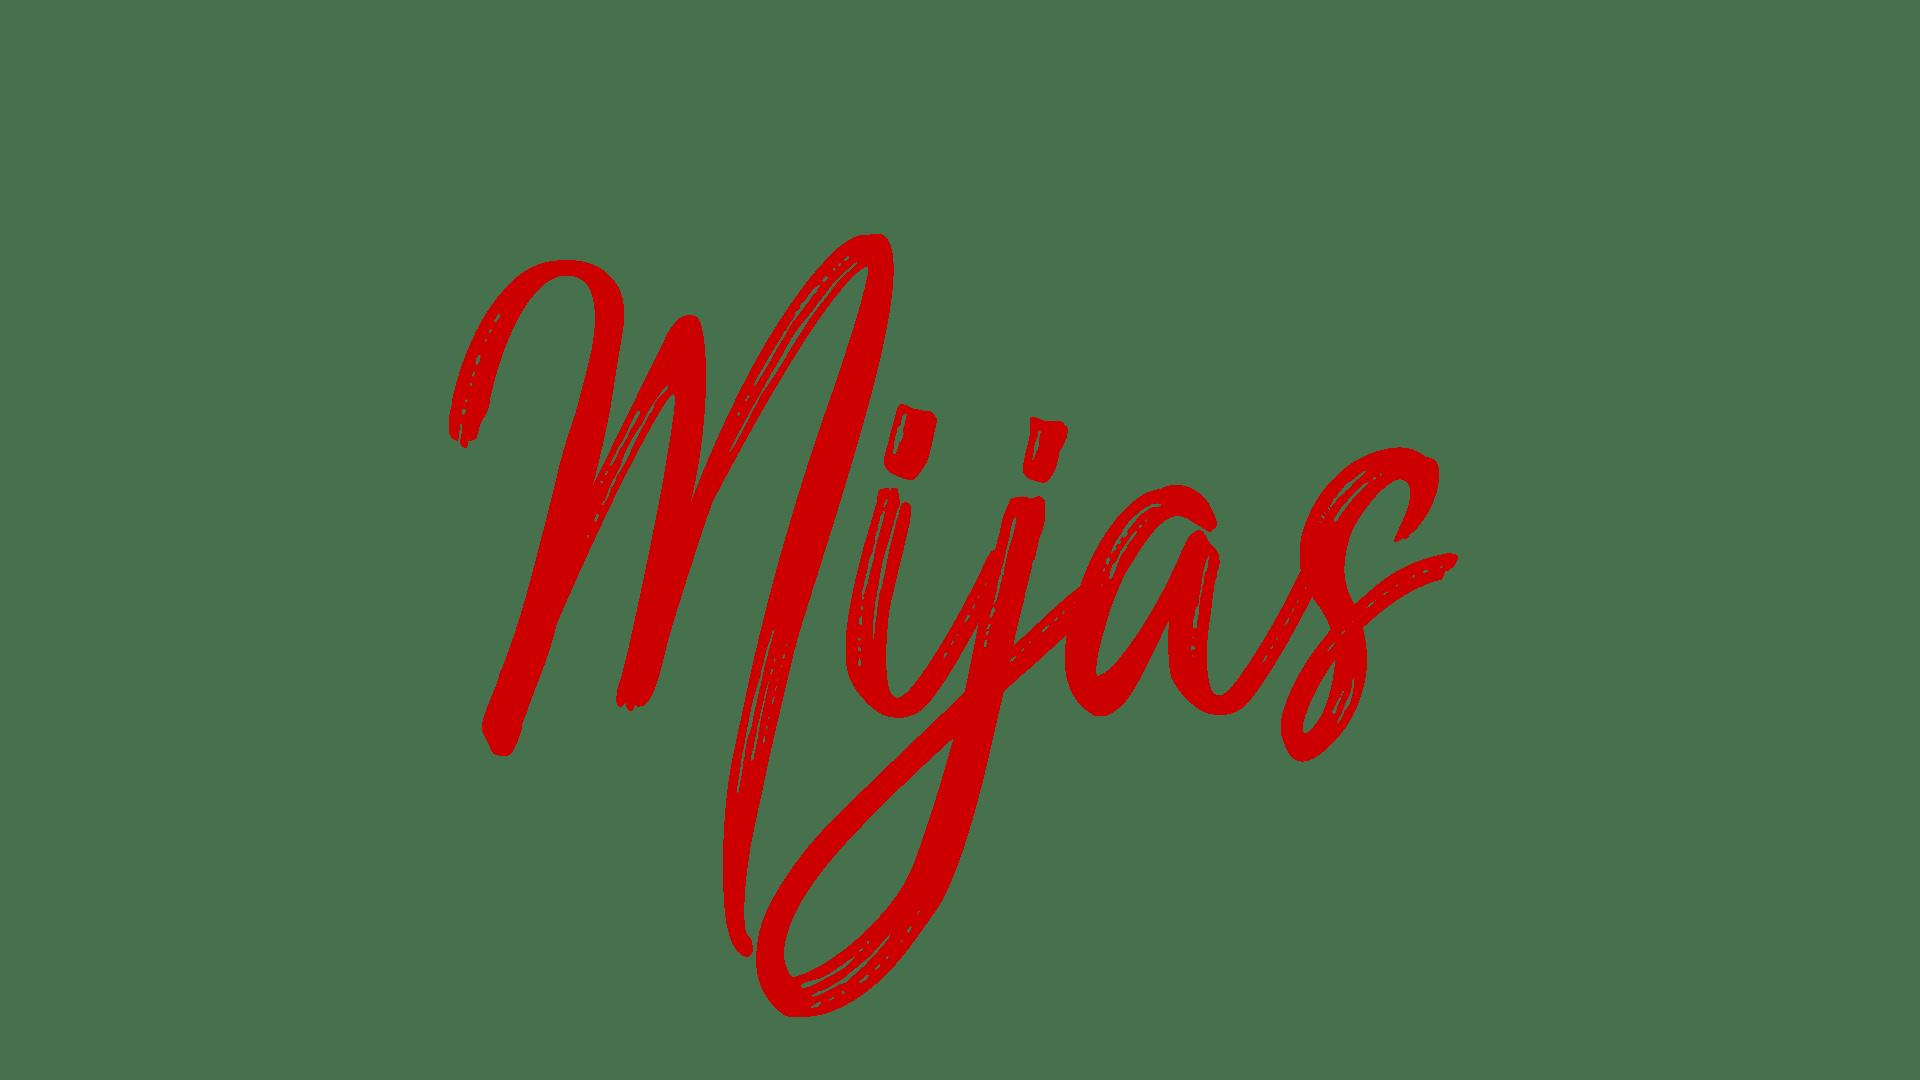 https://www.angelrielo.com/wp-content/uploads/2021/10/Mijas.png